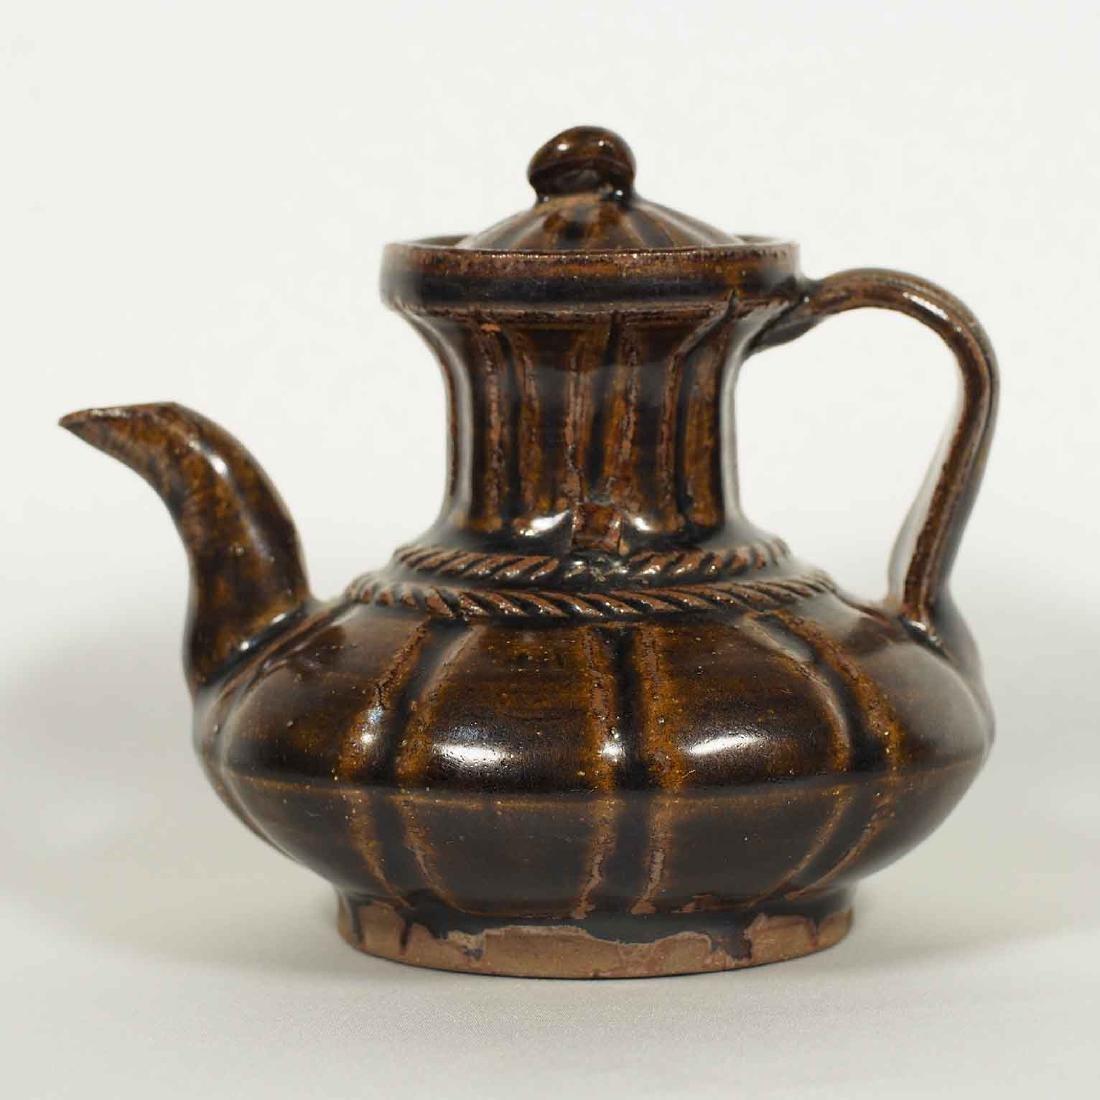 Black glazed Arabic Style Ewer with Lid, Song Dynasty